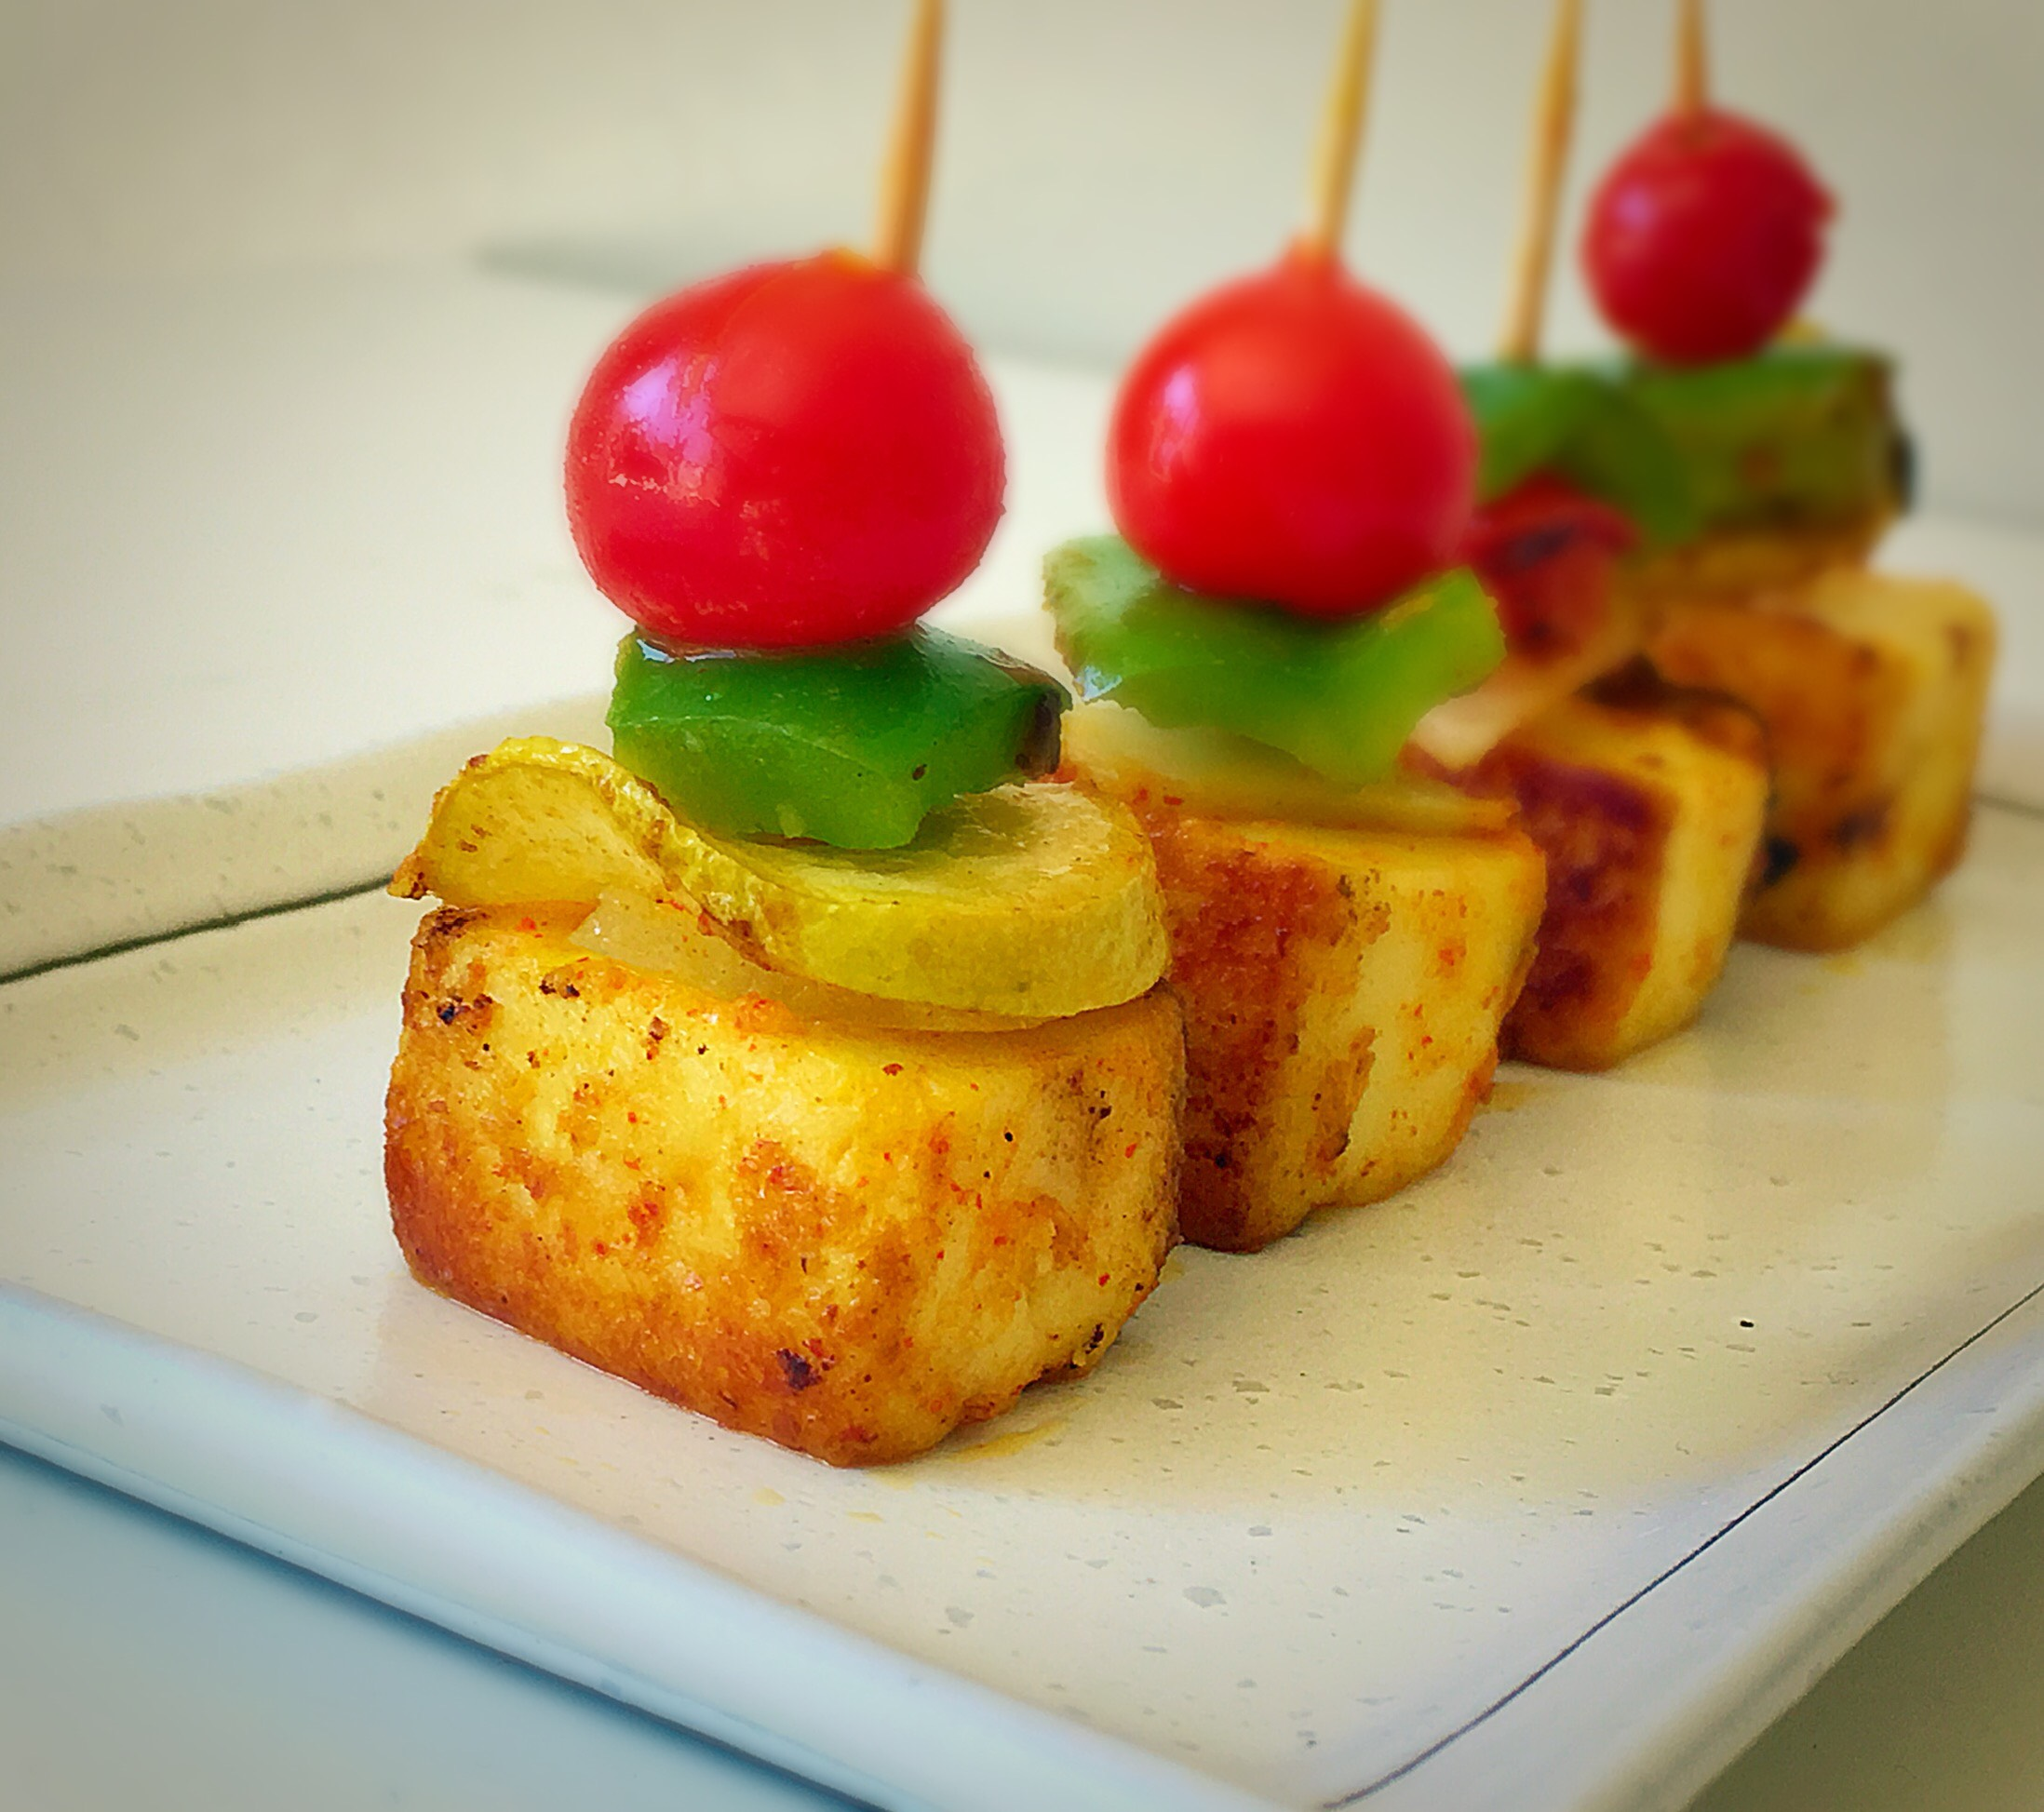 kabab,kebab,paneer kebab,panner kabab,kabab recipe,kebab recipe,paneer kebab recipe,paneer kabab recipe,cottage cheese kabab,cottage cheese kebab